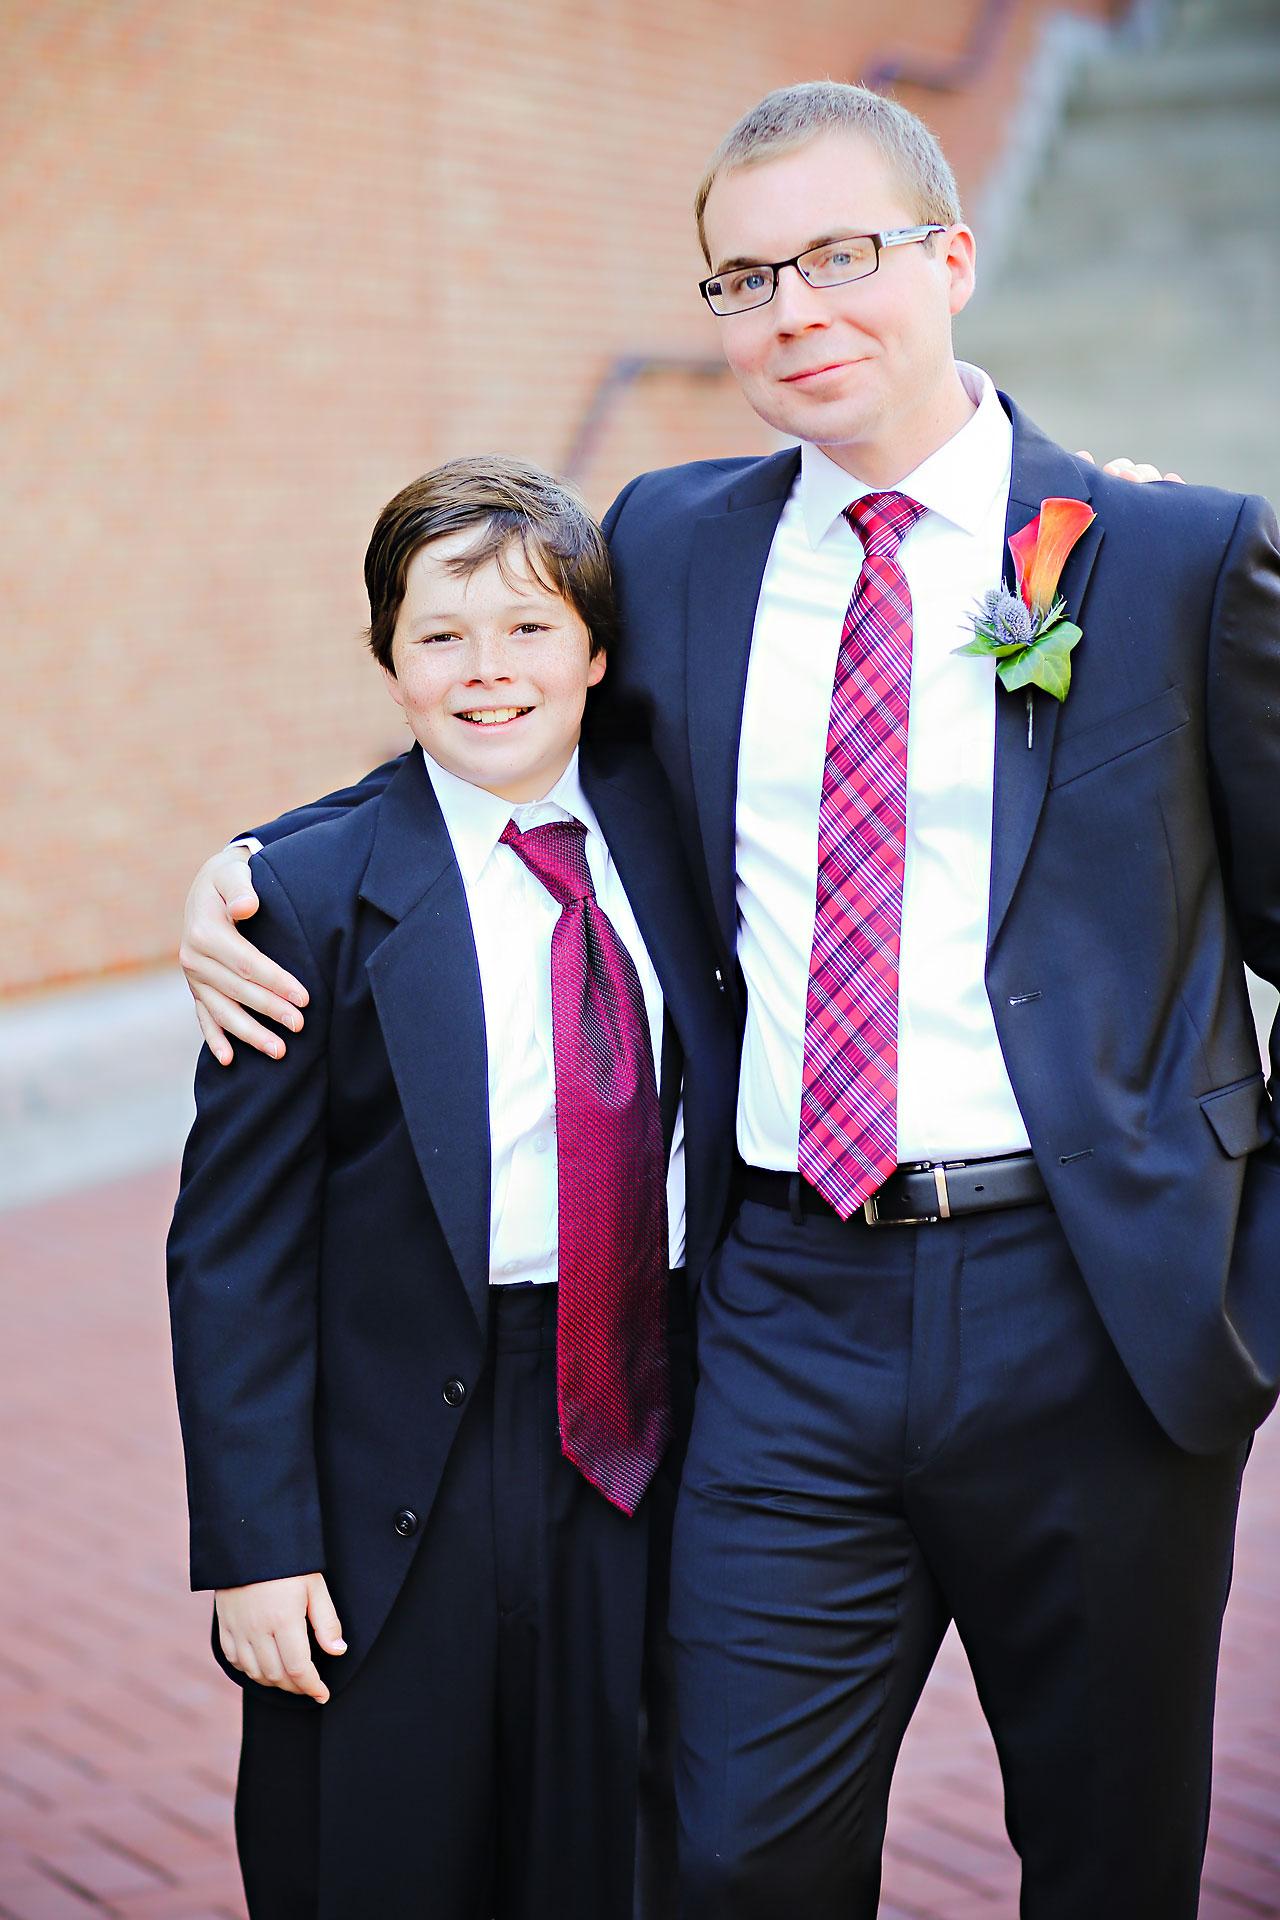 Kate Steve Indiana Historical Society Wedding 073